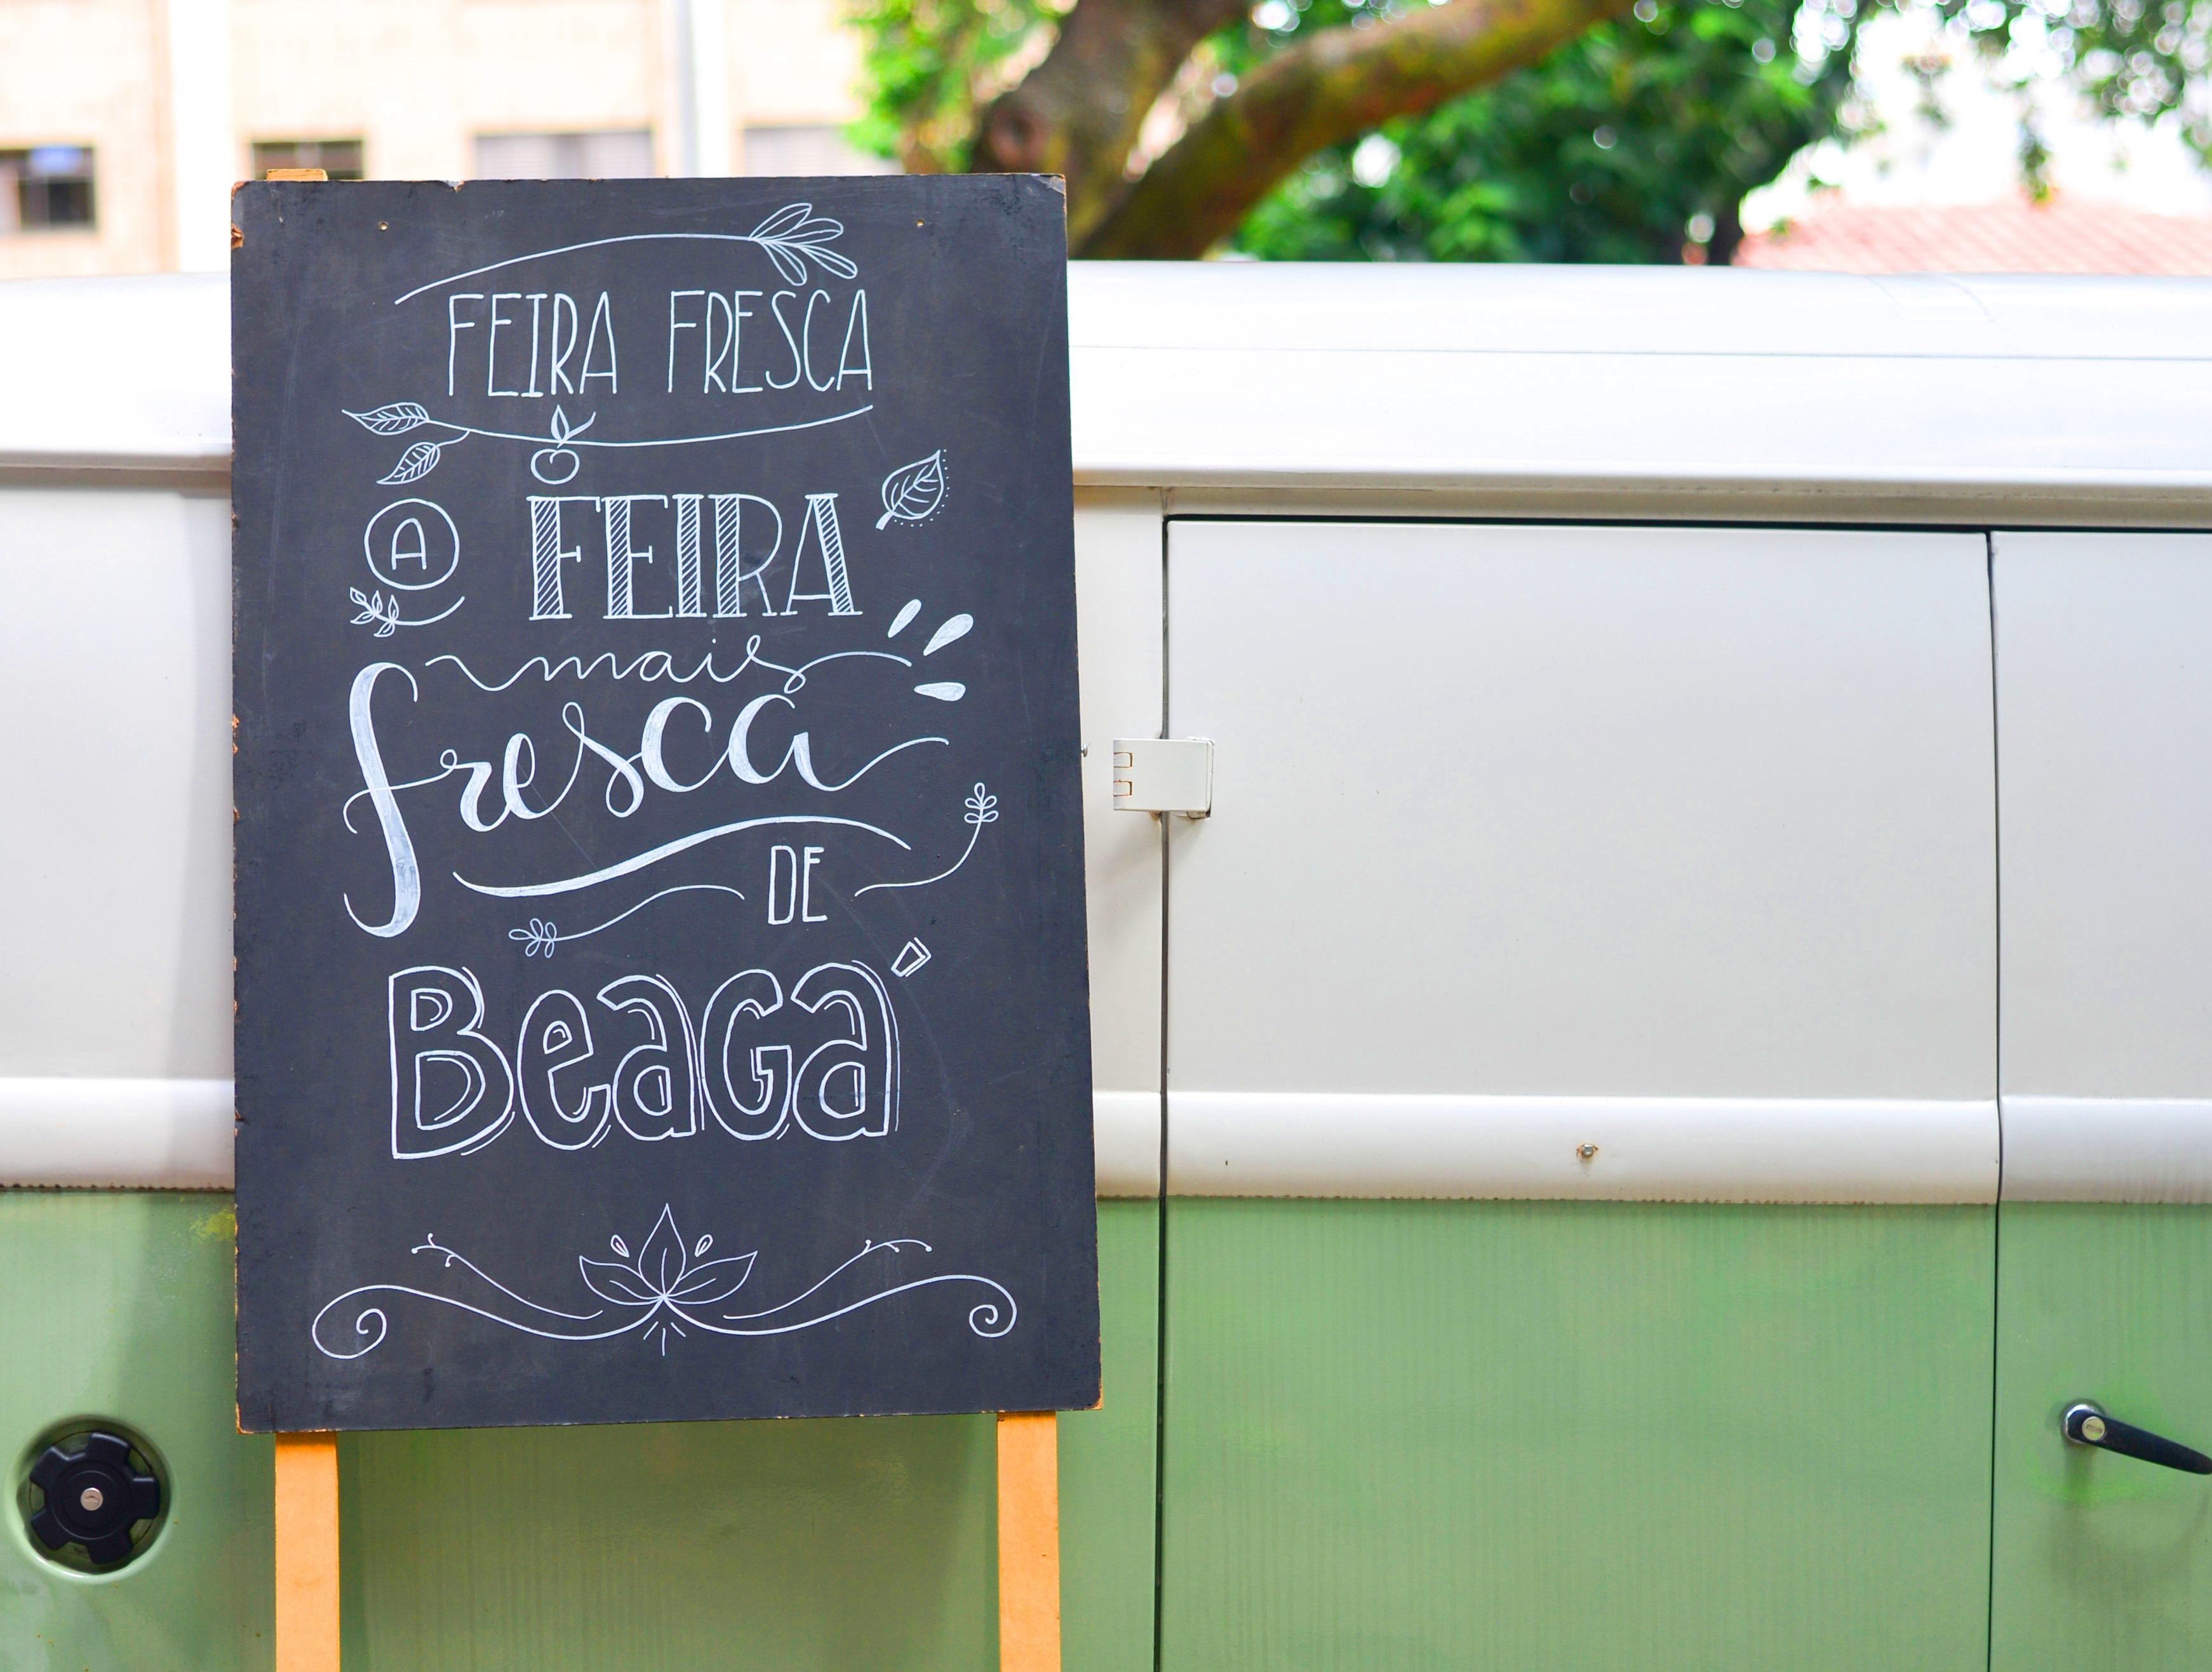 Kombi Feira Fresca - A Fresca mais Fresca de Beagá